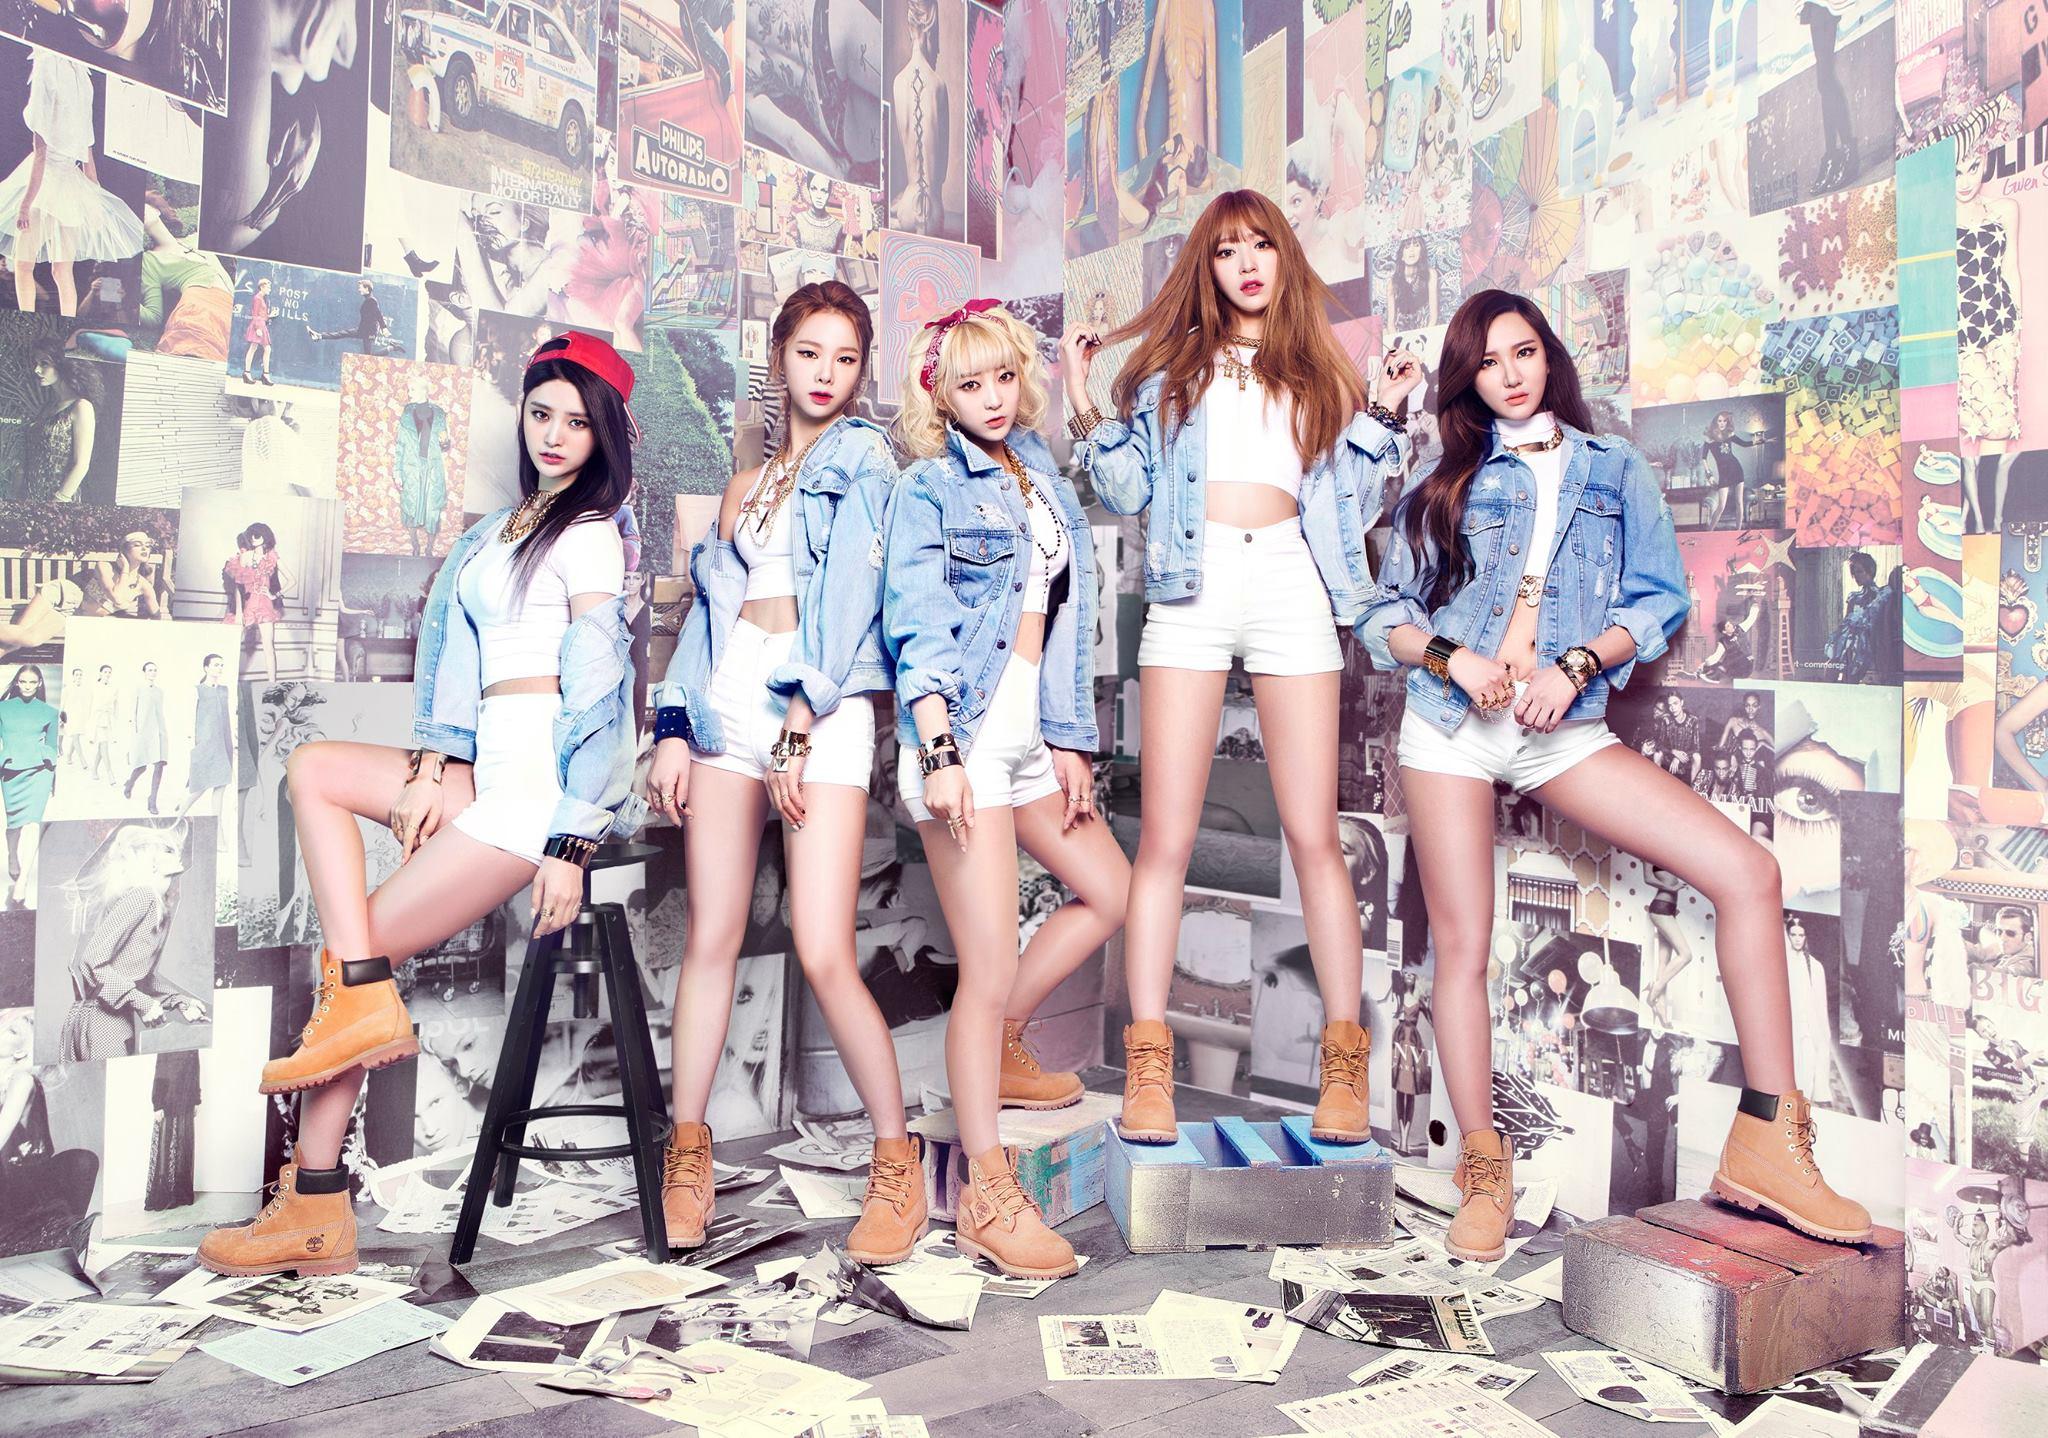 ★ EXID :: 1058 天 ★  「we 阿哩~we 阿哩~」大家以為 EXID 是剛出道的女團嗎?不不不!她們其實是 2012年就出道的女團,一直到去年才以《Up & Down》受到大家的關注。